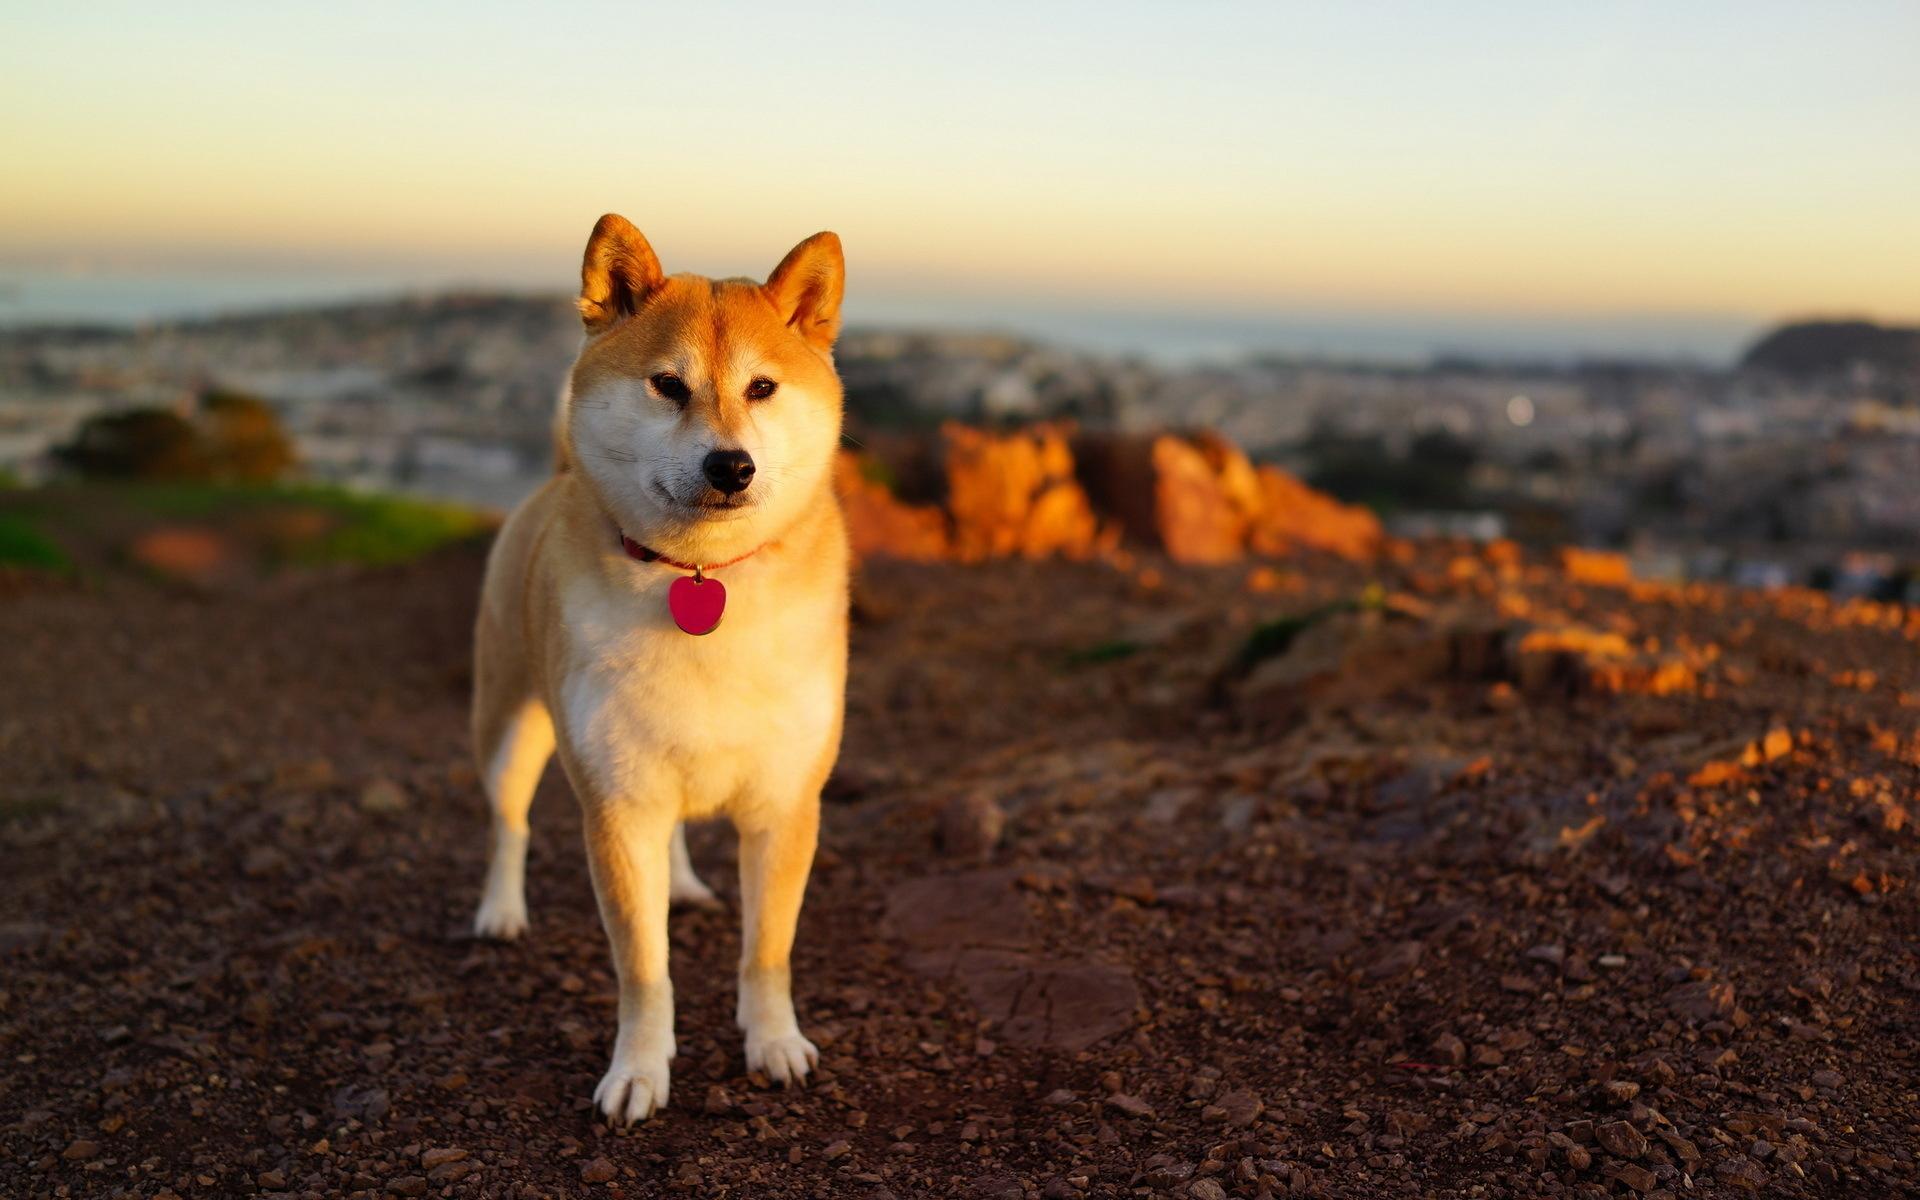 Собака на фоне заката  № 2038636 загрузить